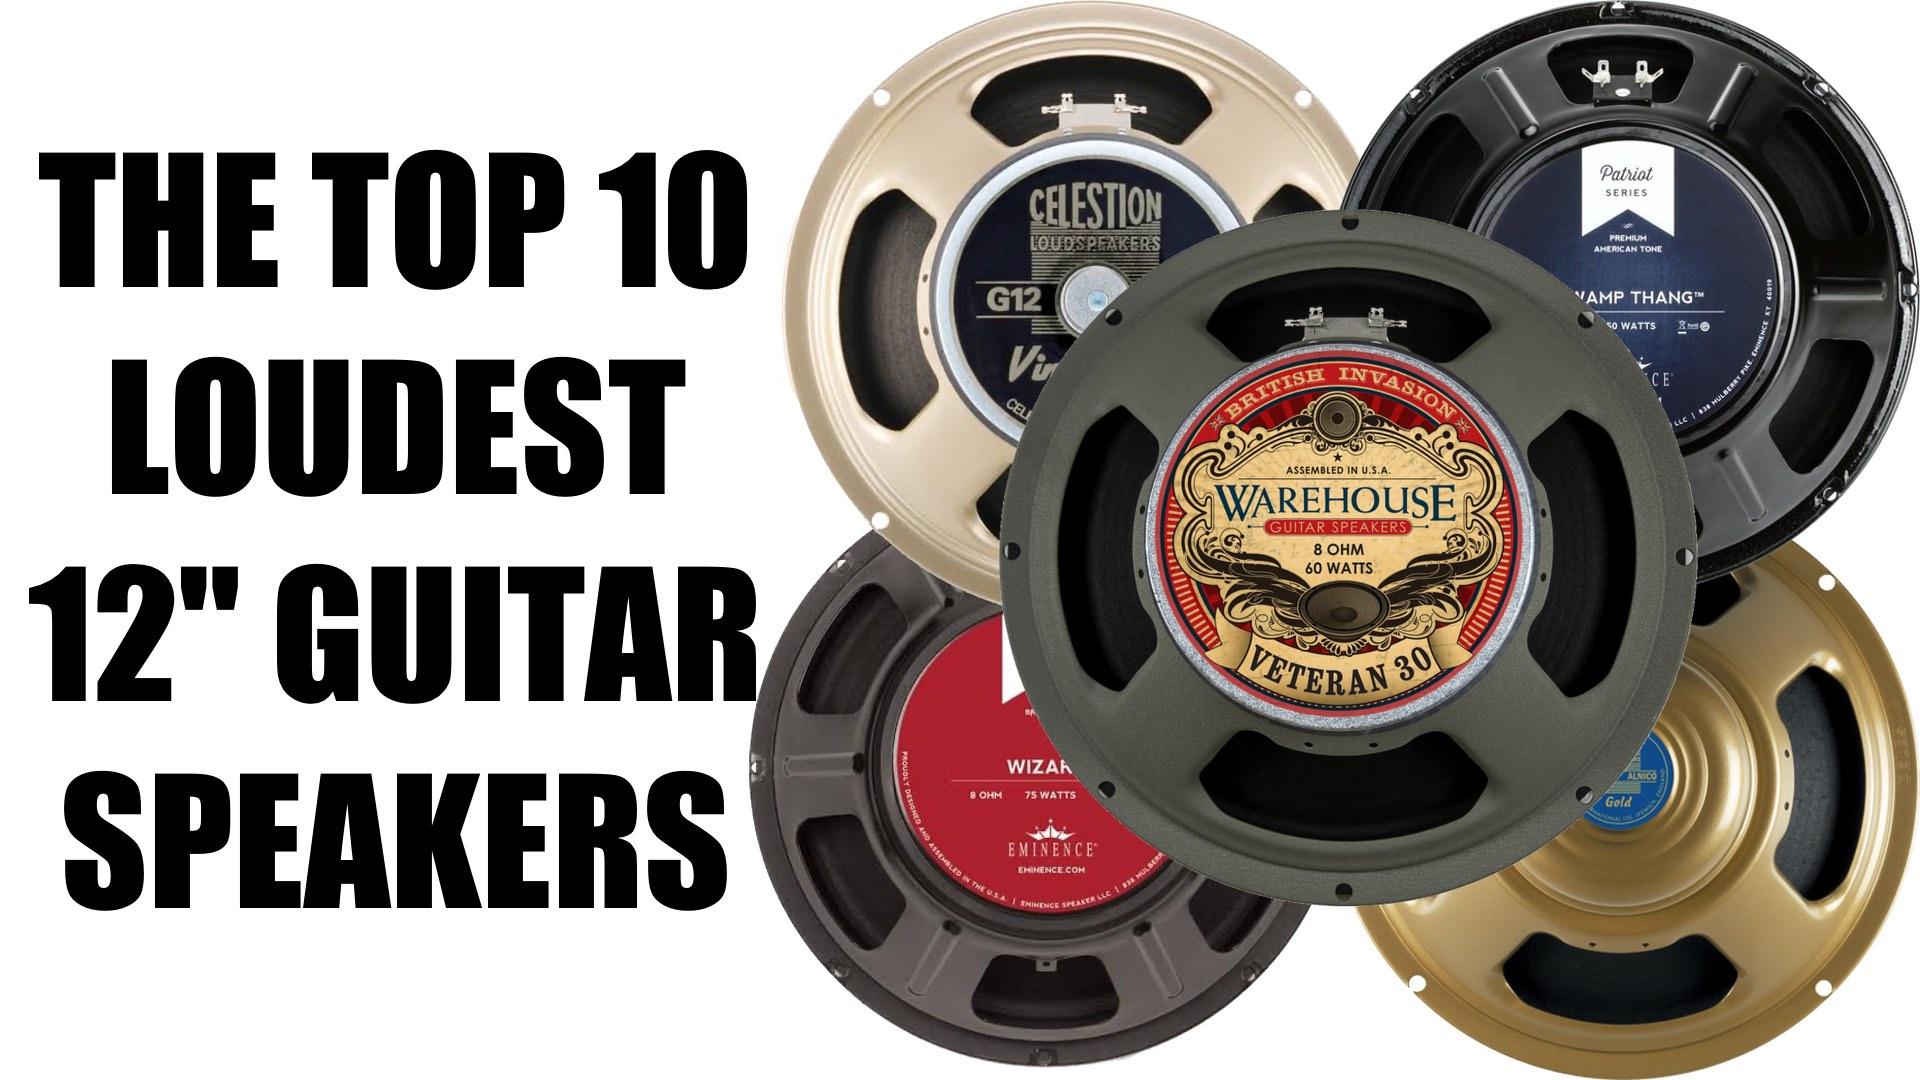 "Top 10 Loudest 12"" Guitar Speakers"